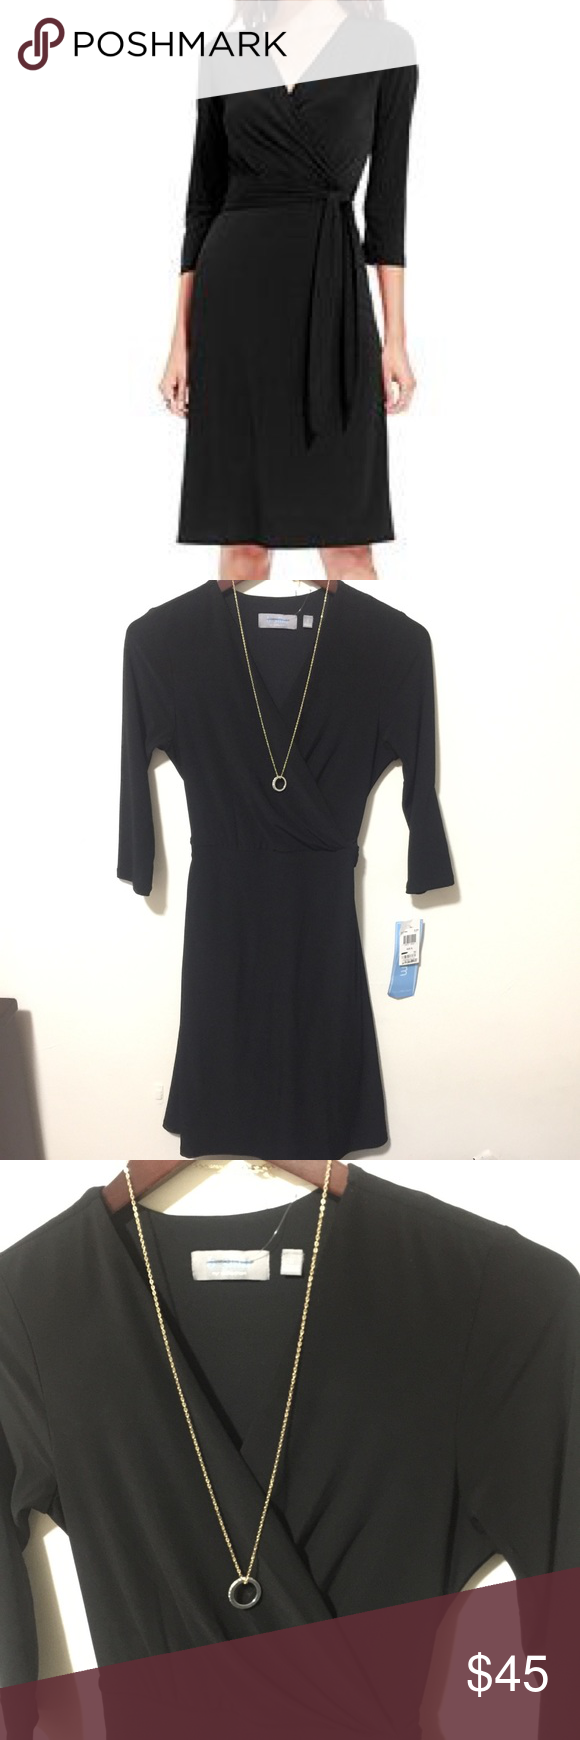 Make offers tummy slimmer tech black wrap dress nwt my posh